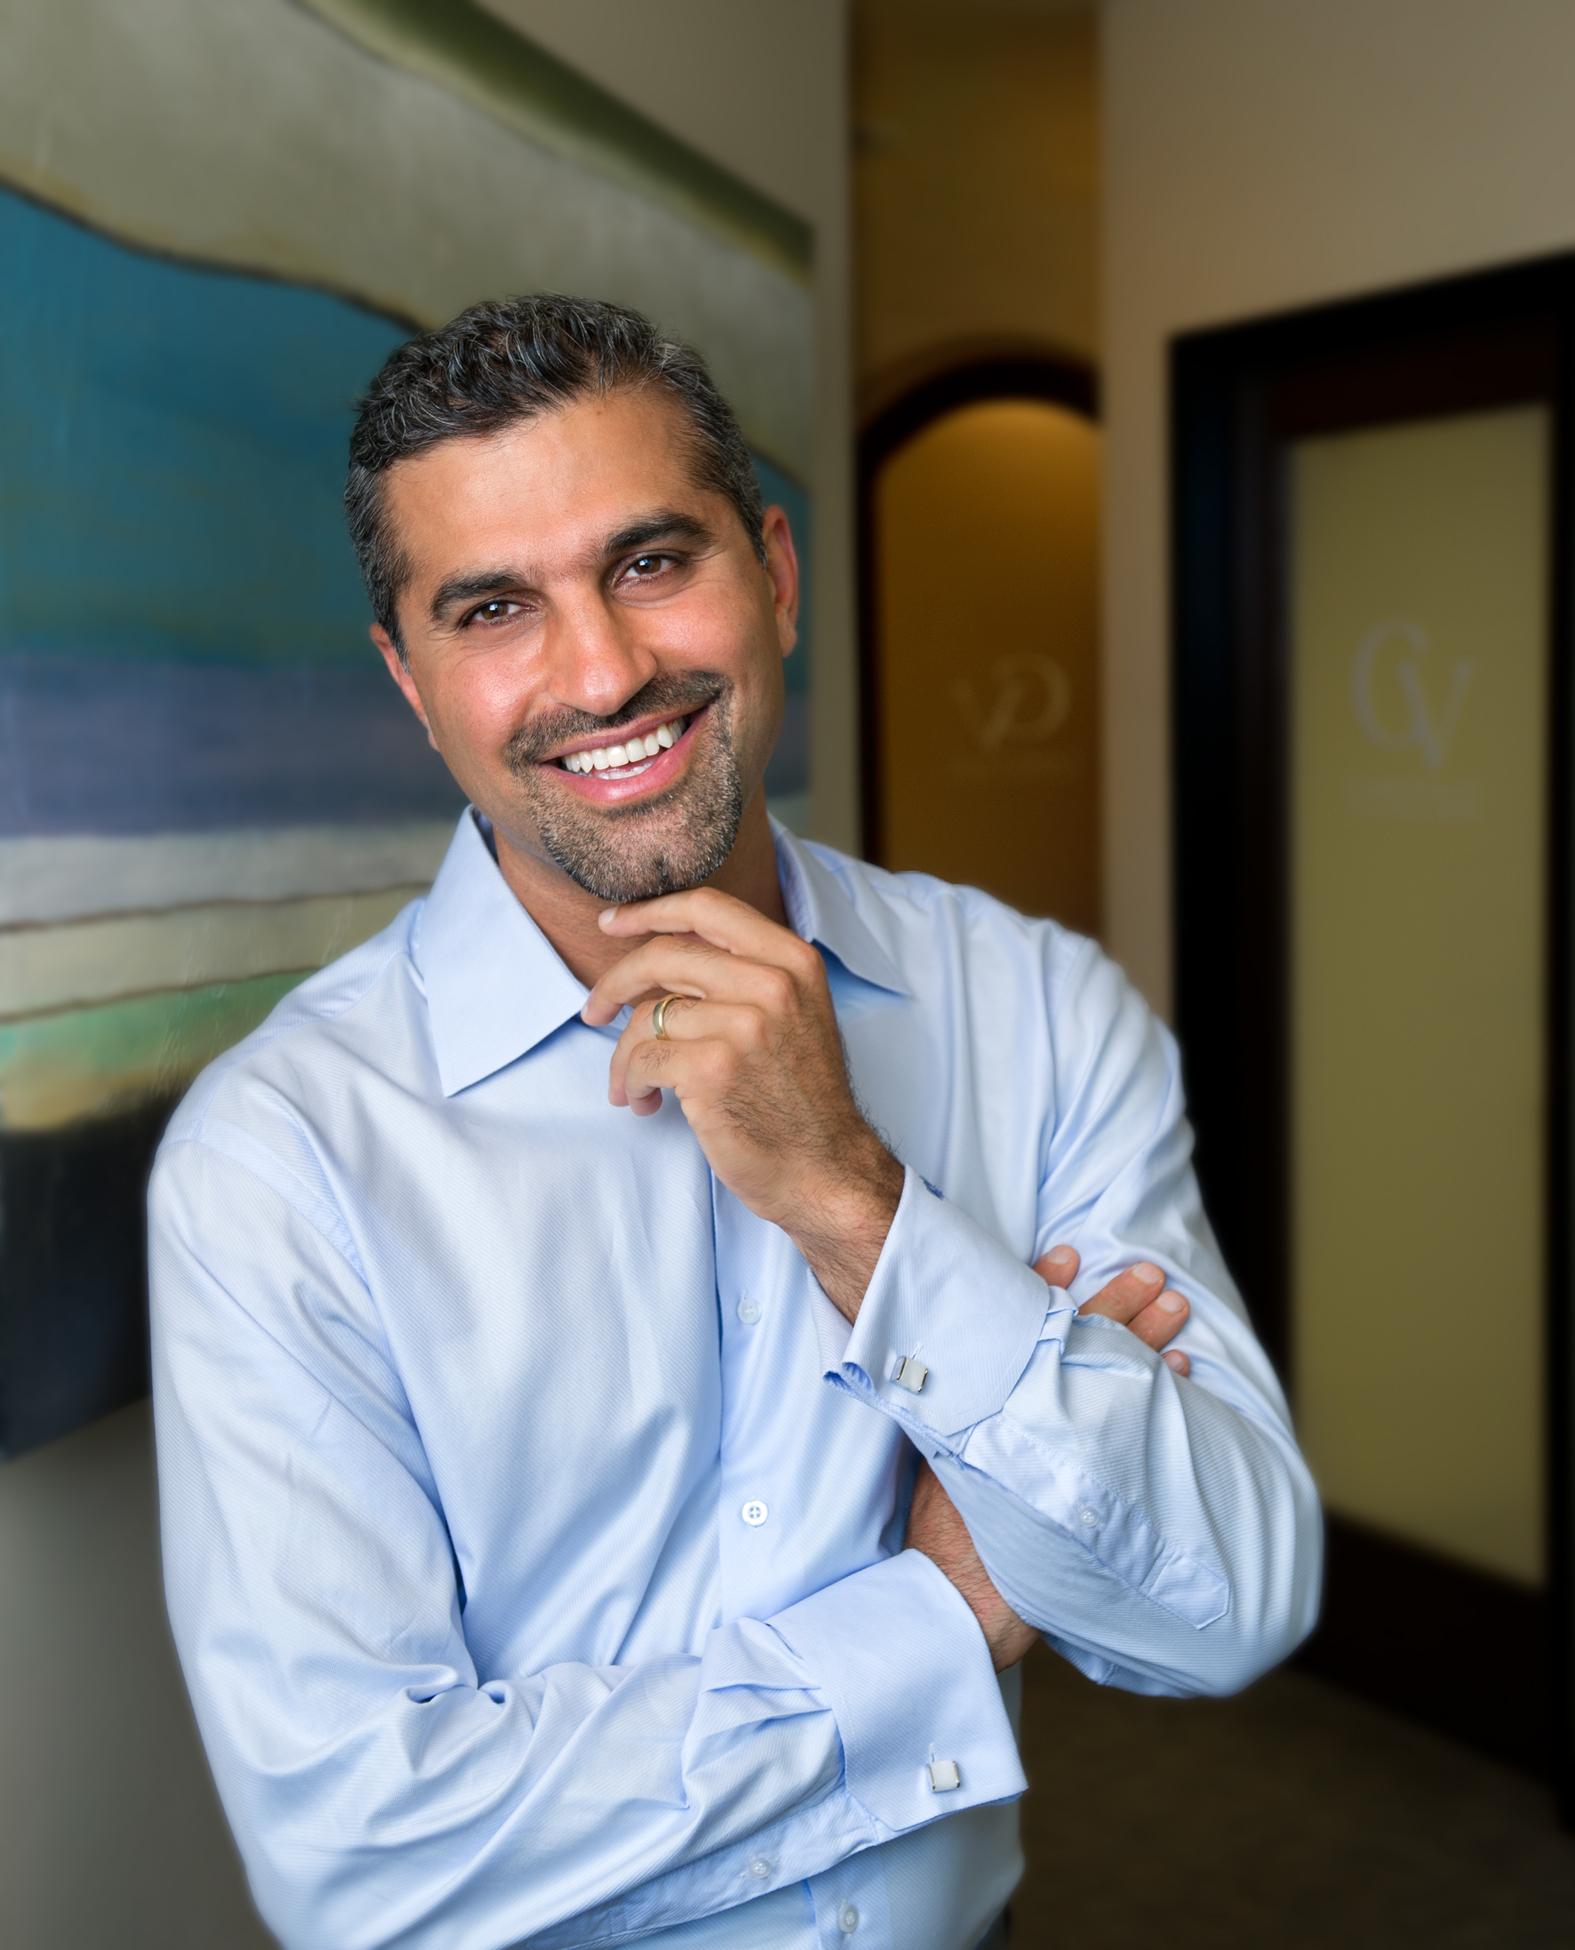 Board certified facial plastic surgeon in San Diego, Amir Karam MD